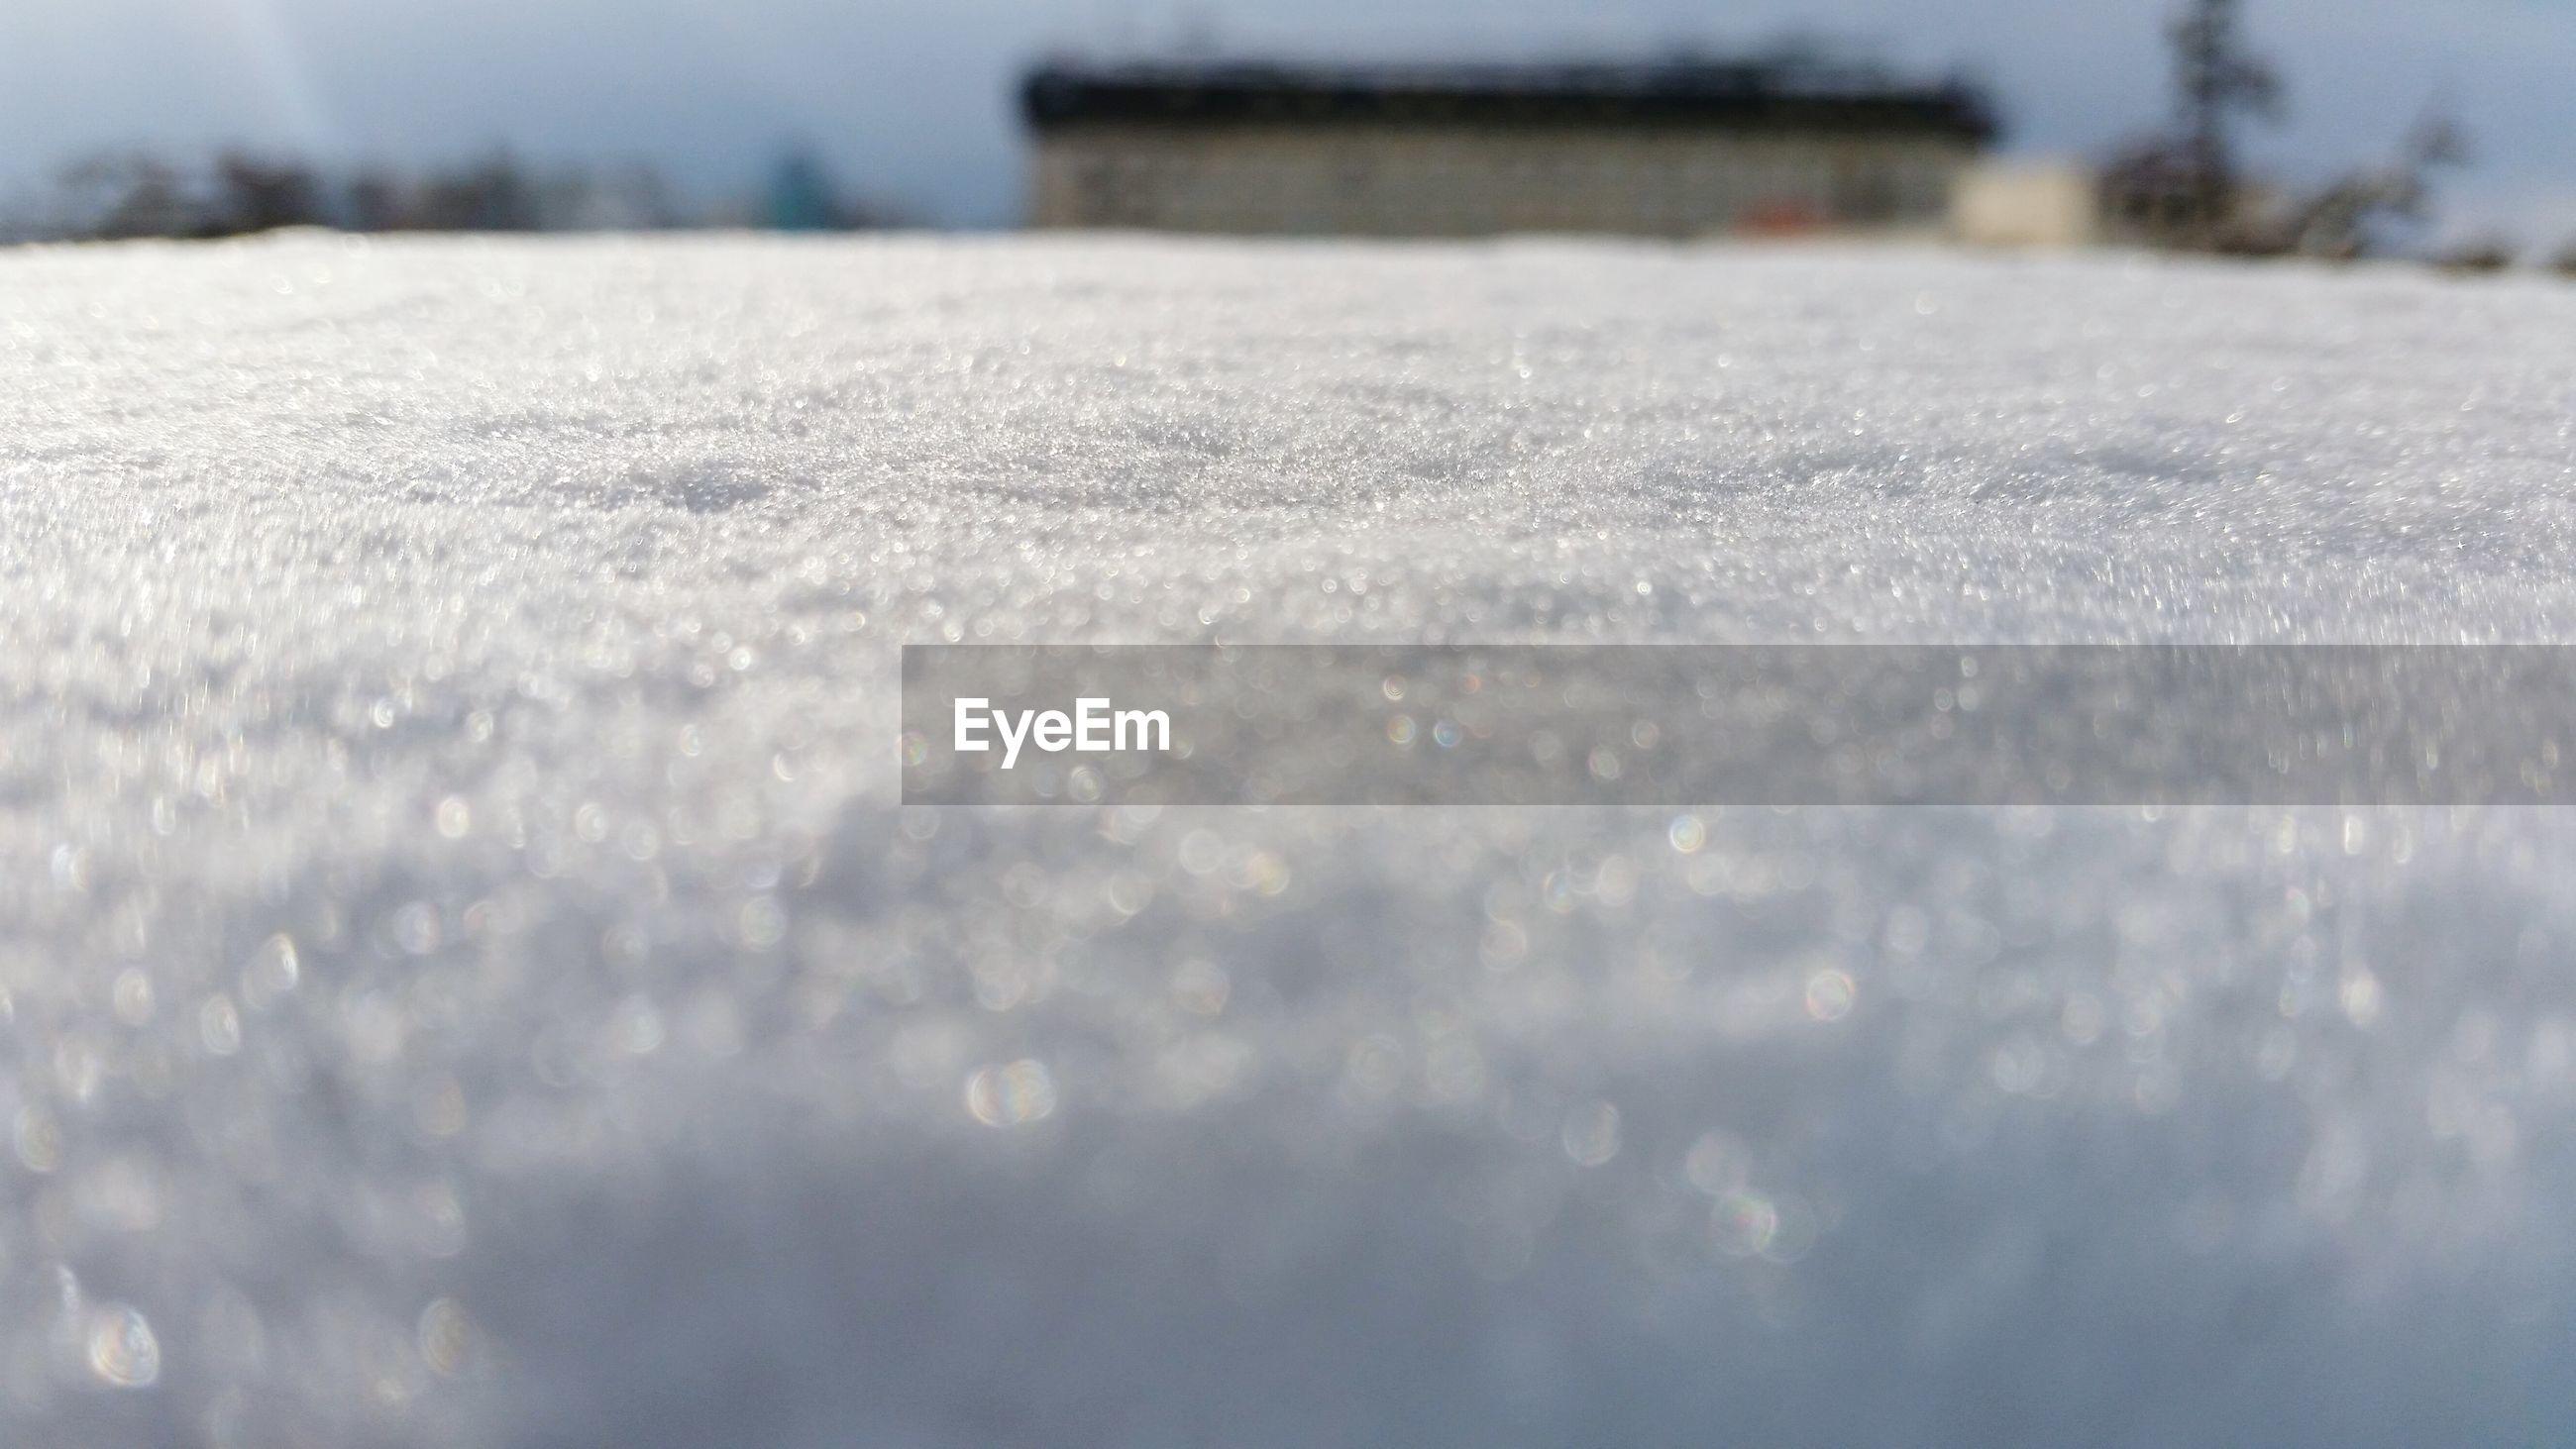 Close-up of frozen balcony